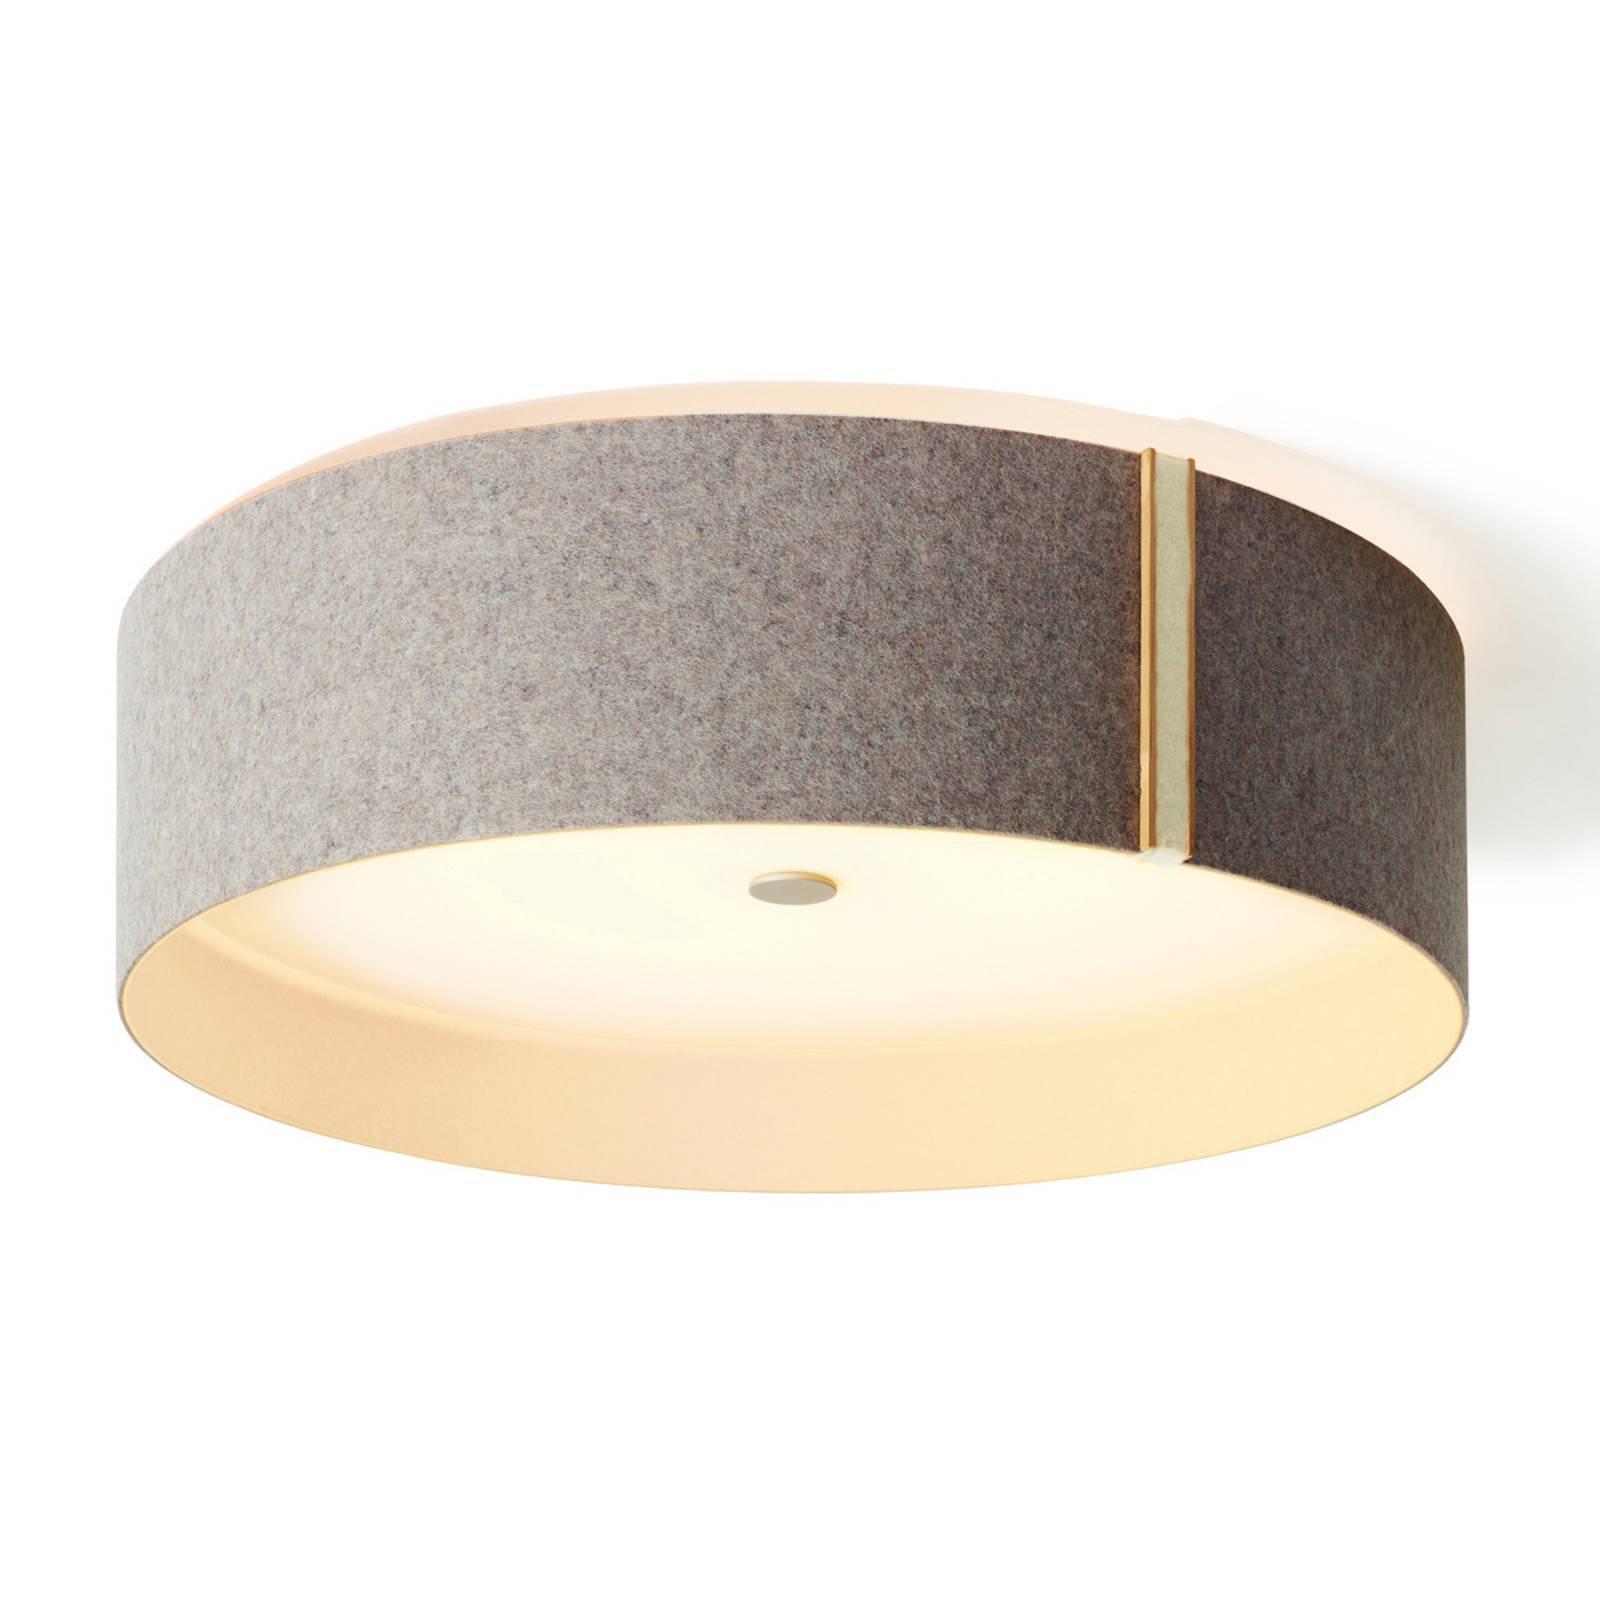 Taklampe Lara felt i filt med LED, grå, helhvit